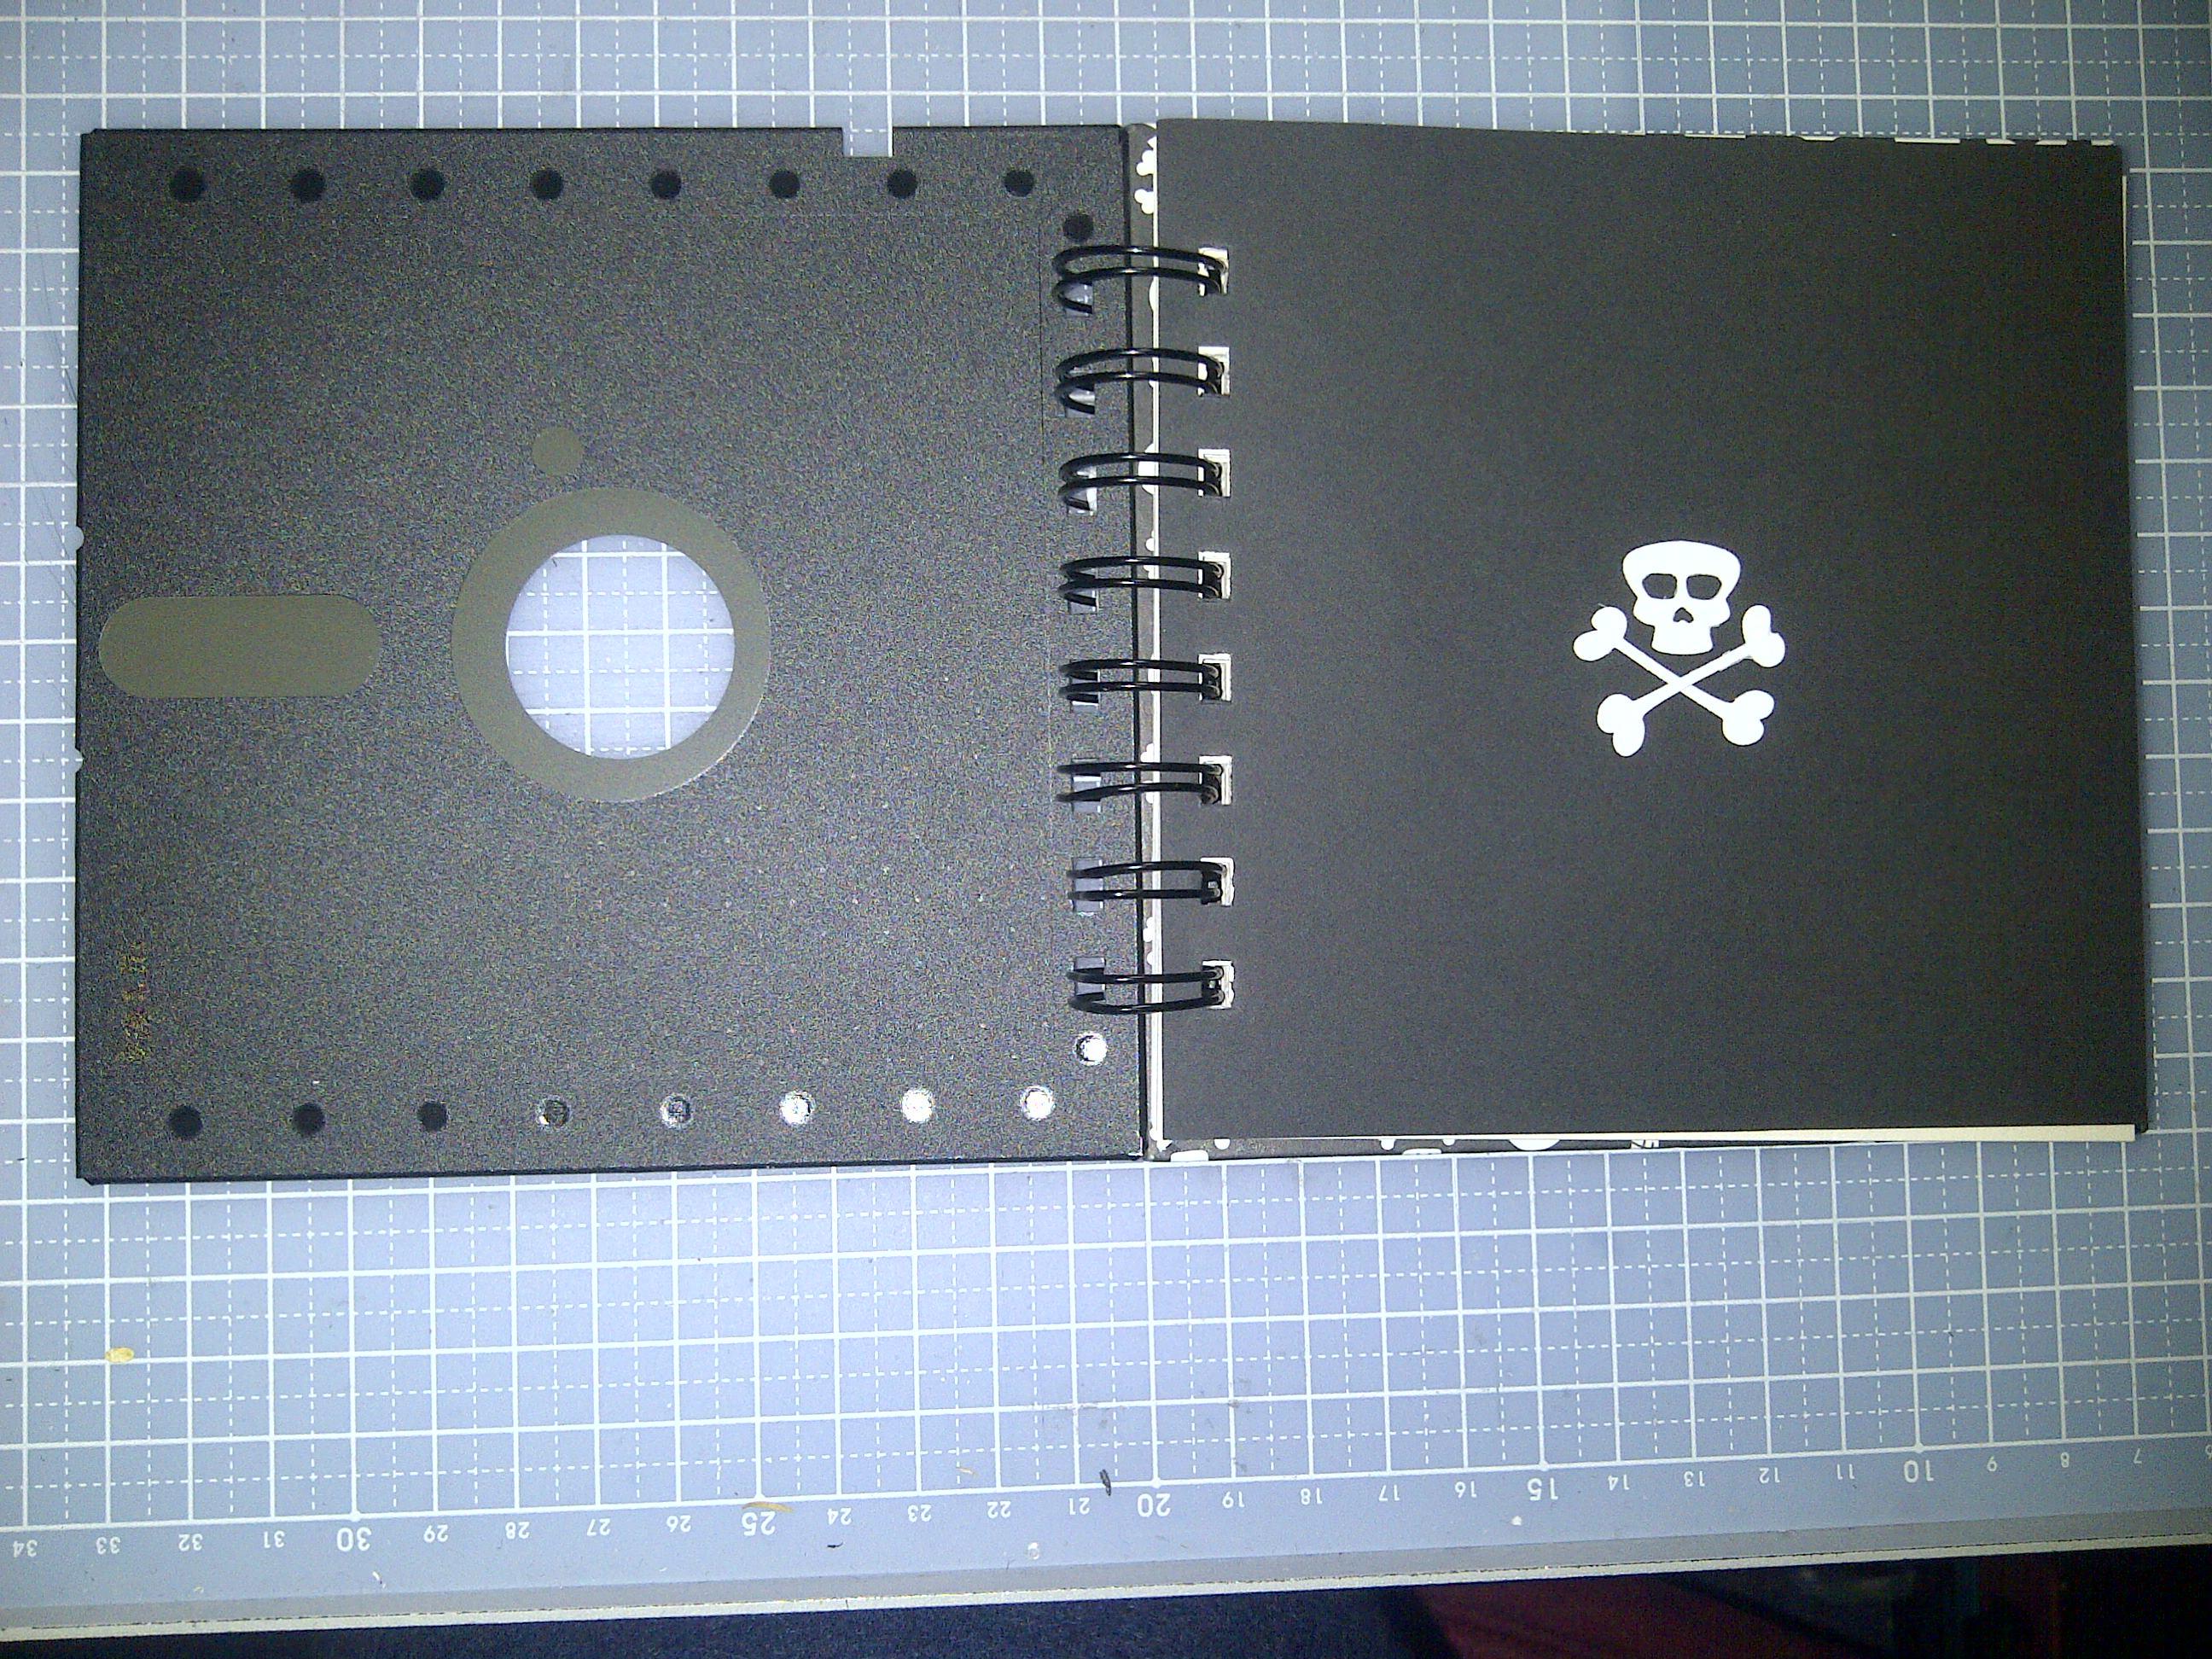 5 inch floppy book inside